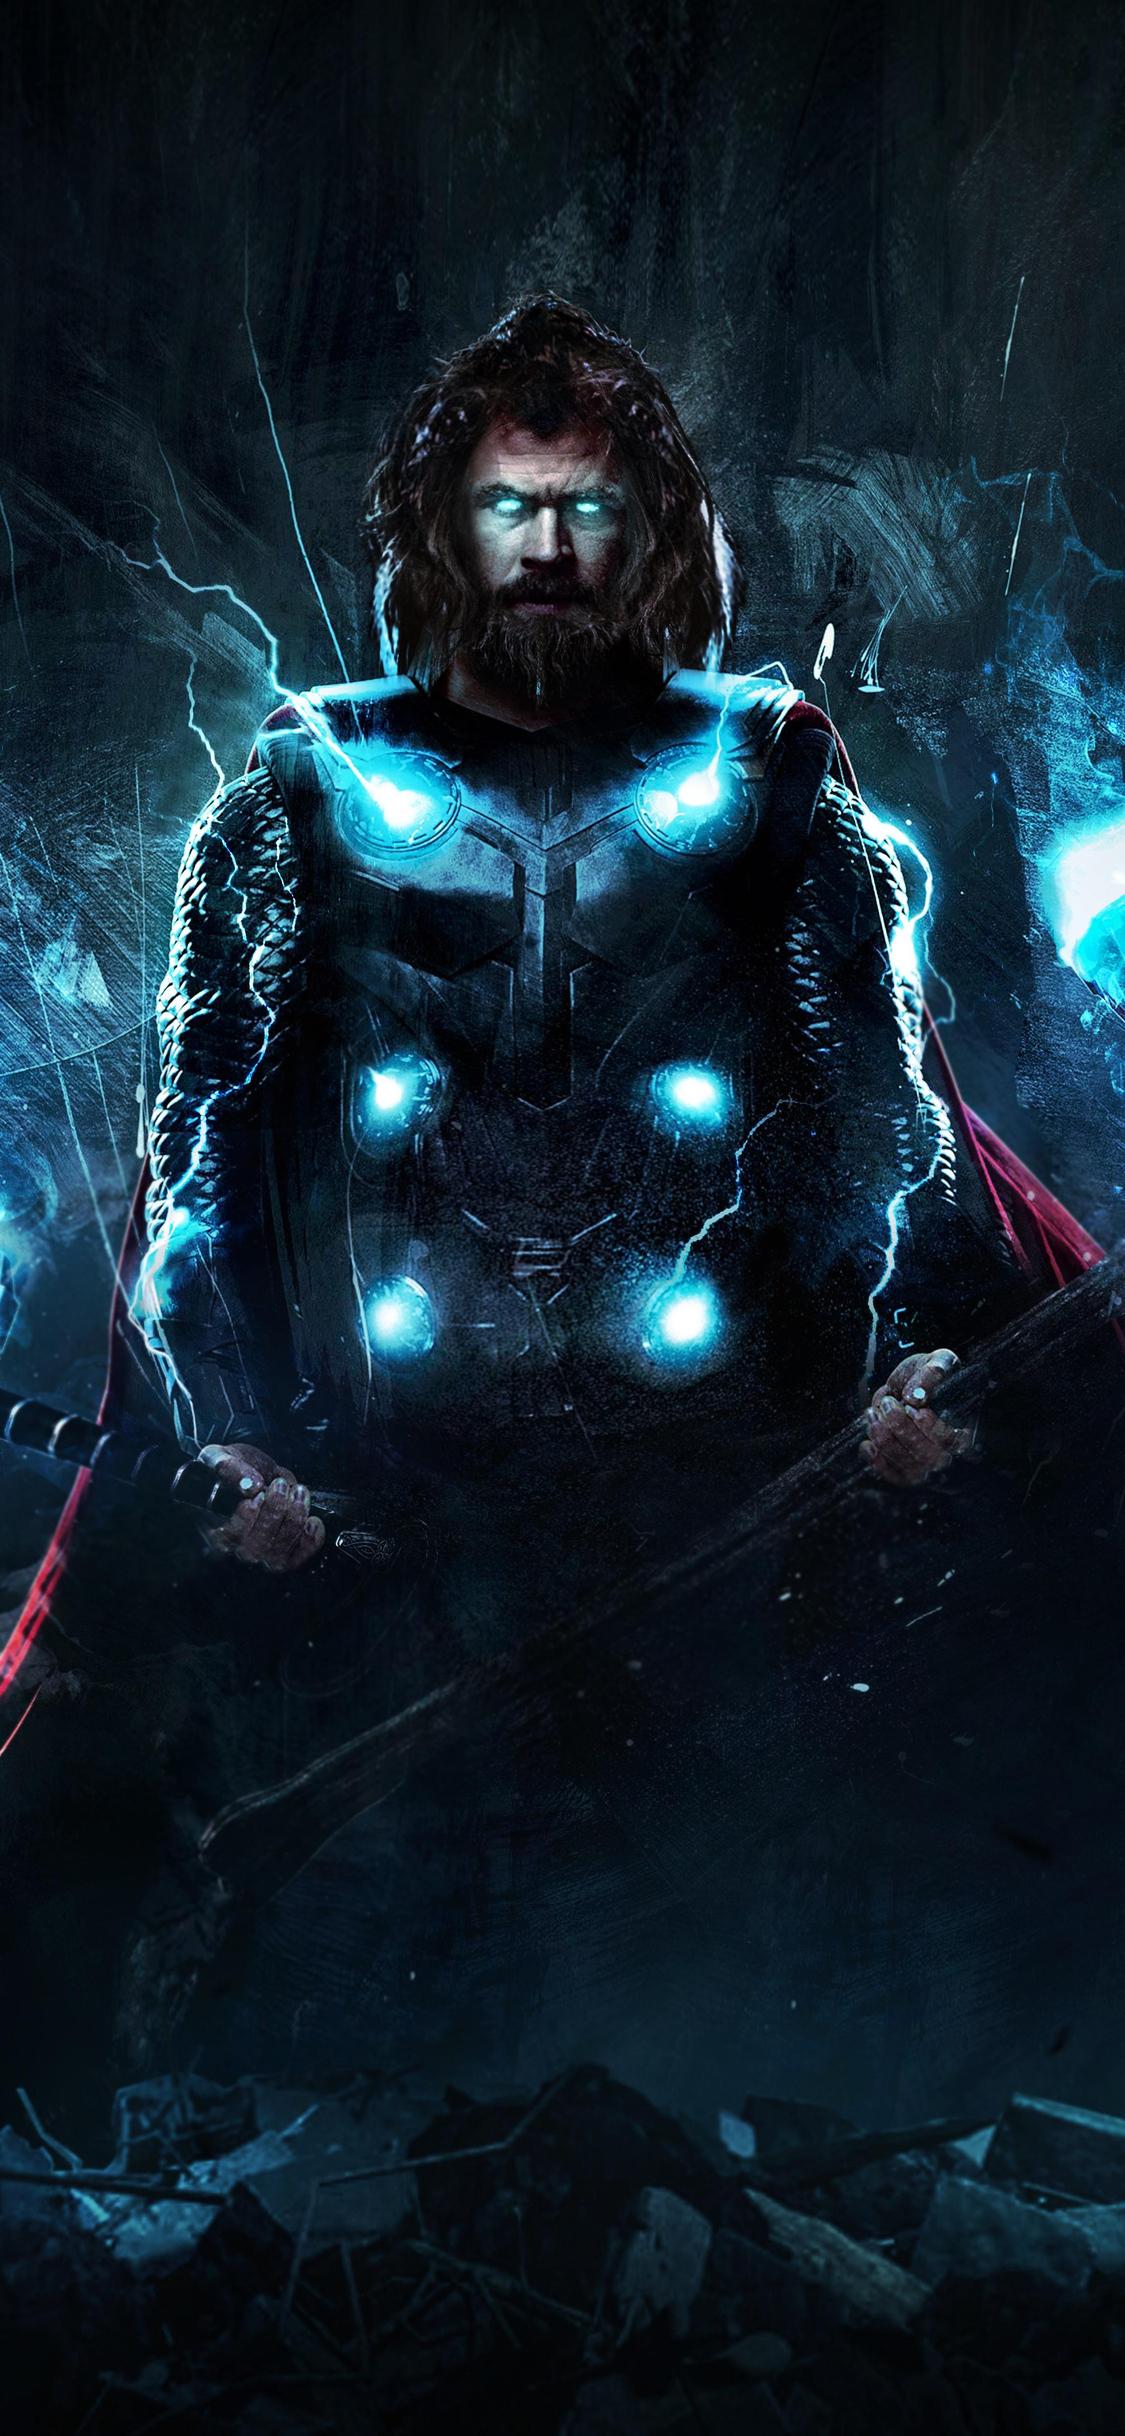 1125x2436 4k Thor In Avengers Endgame Iphone Xsiphone 10